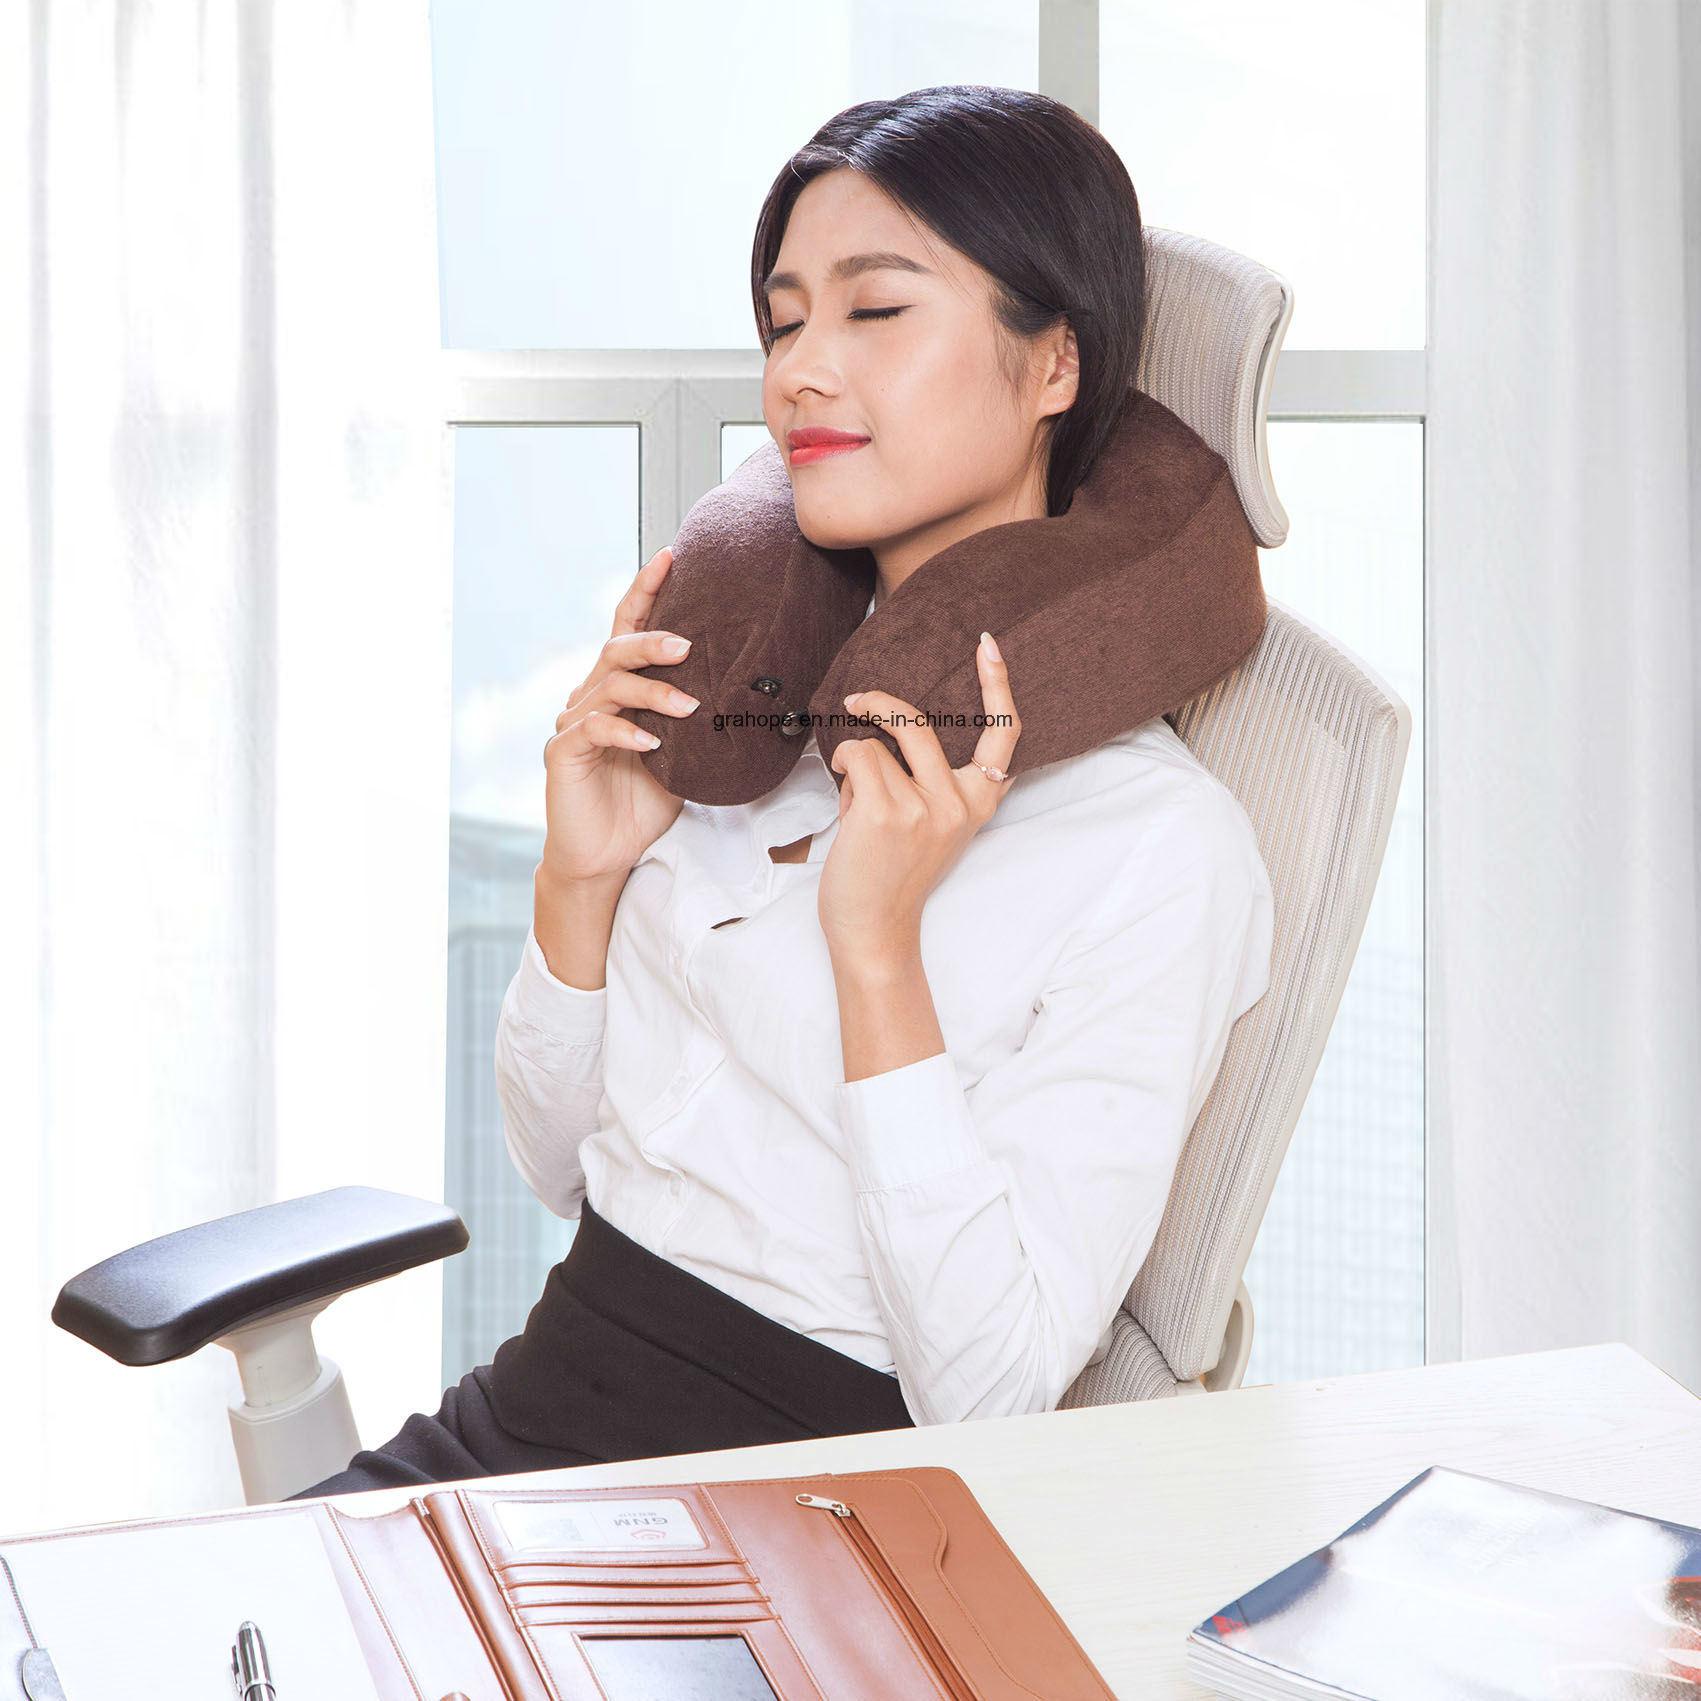 Heating Travel Neck Pillow